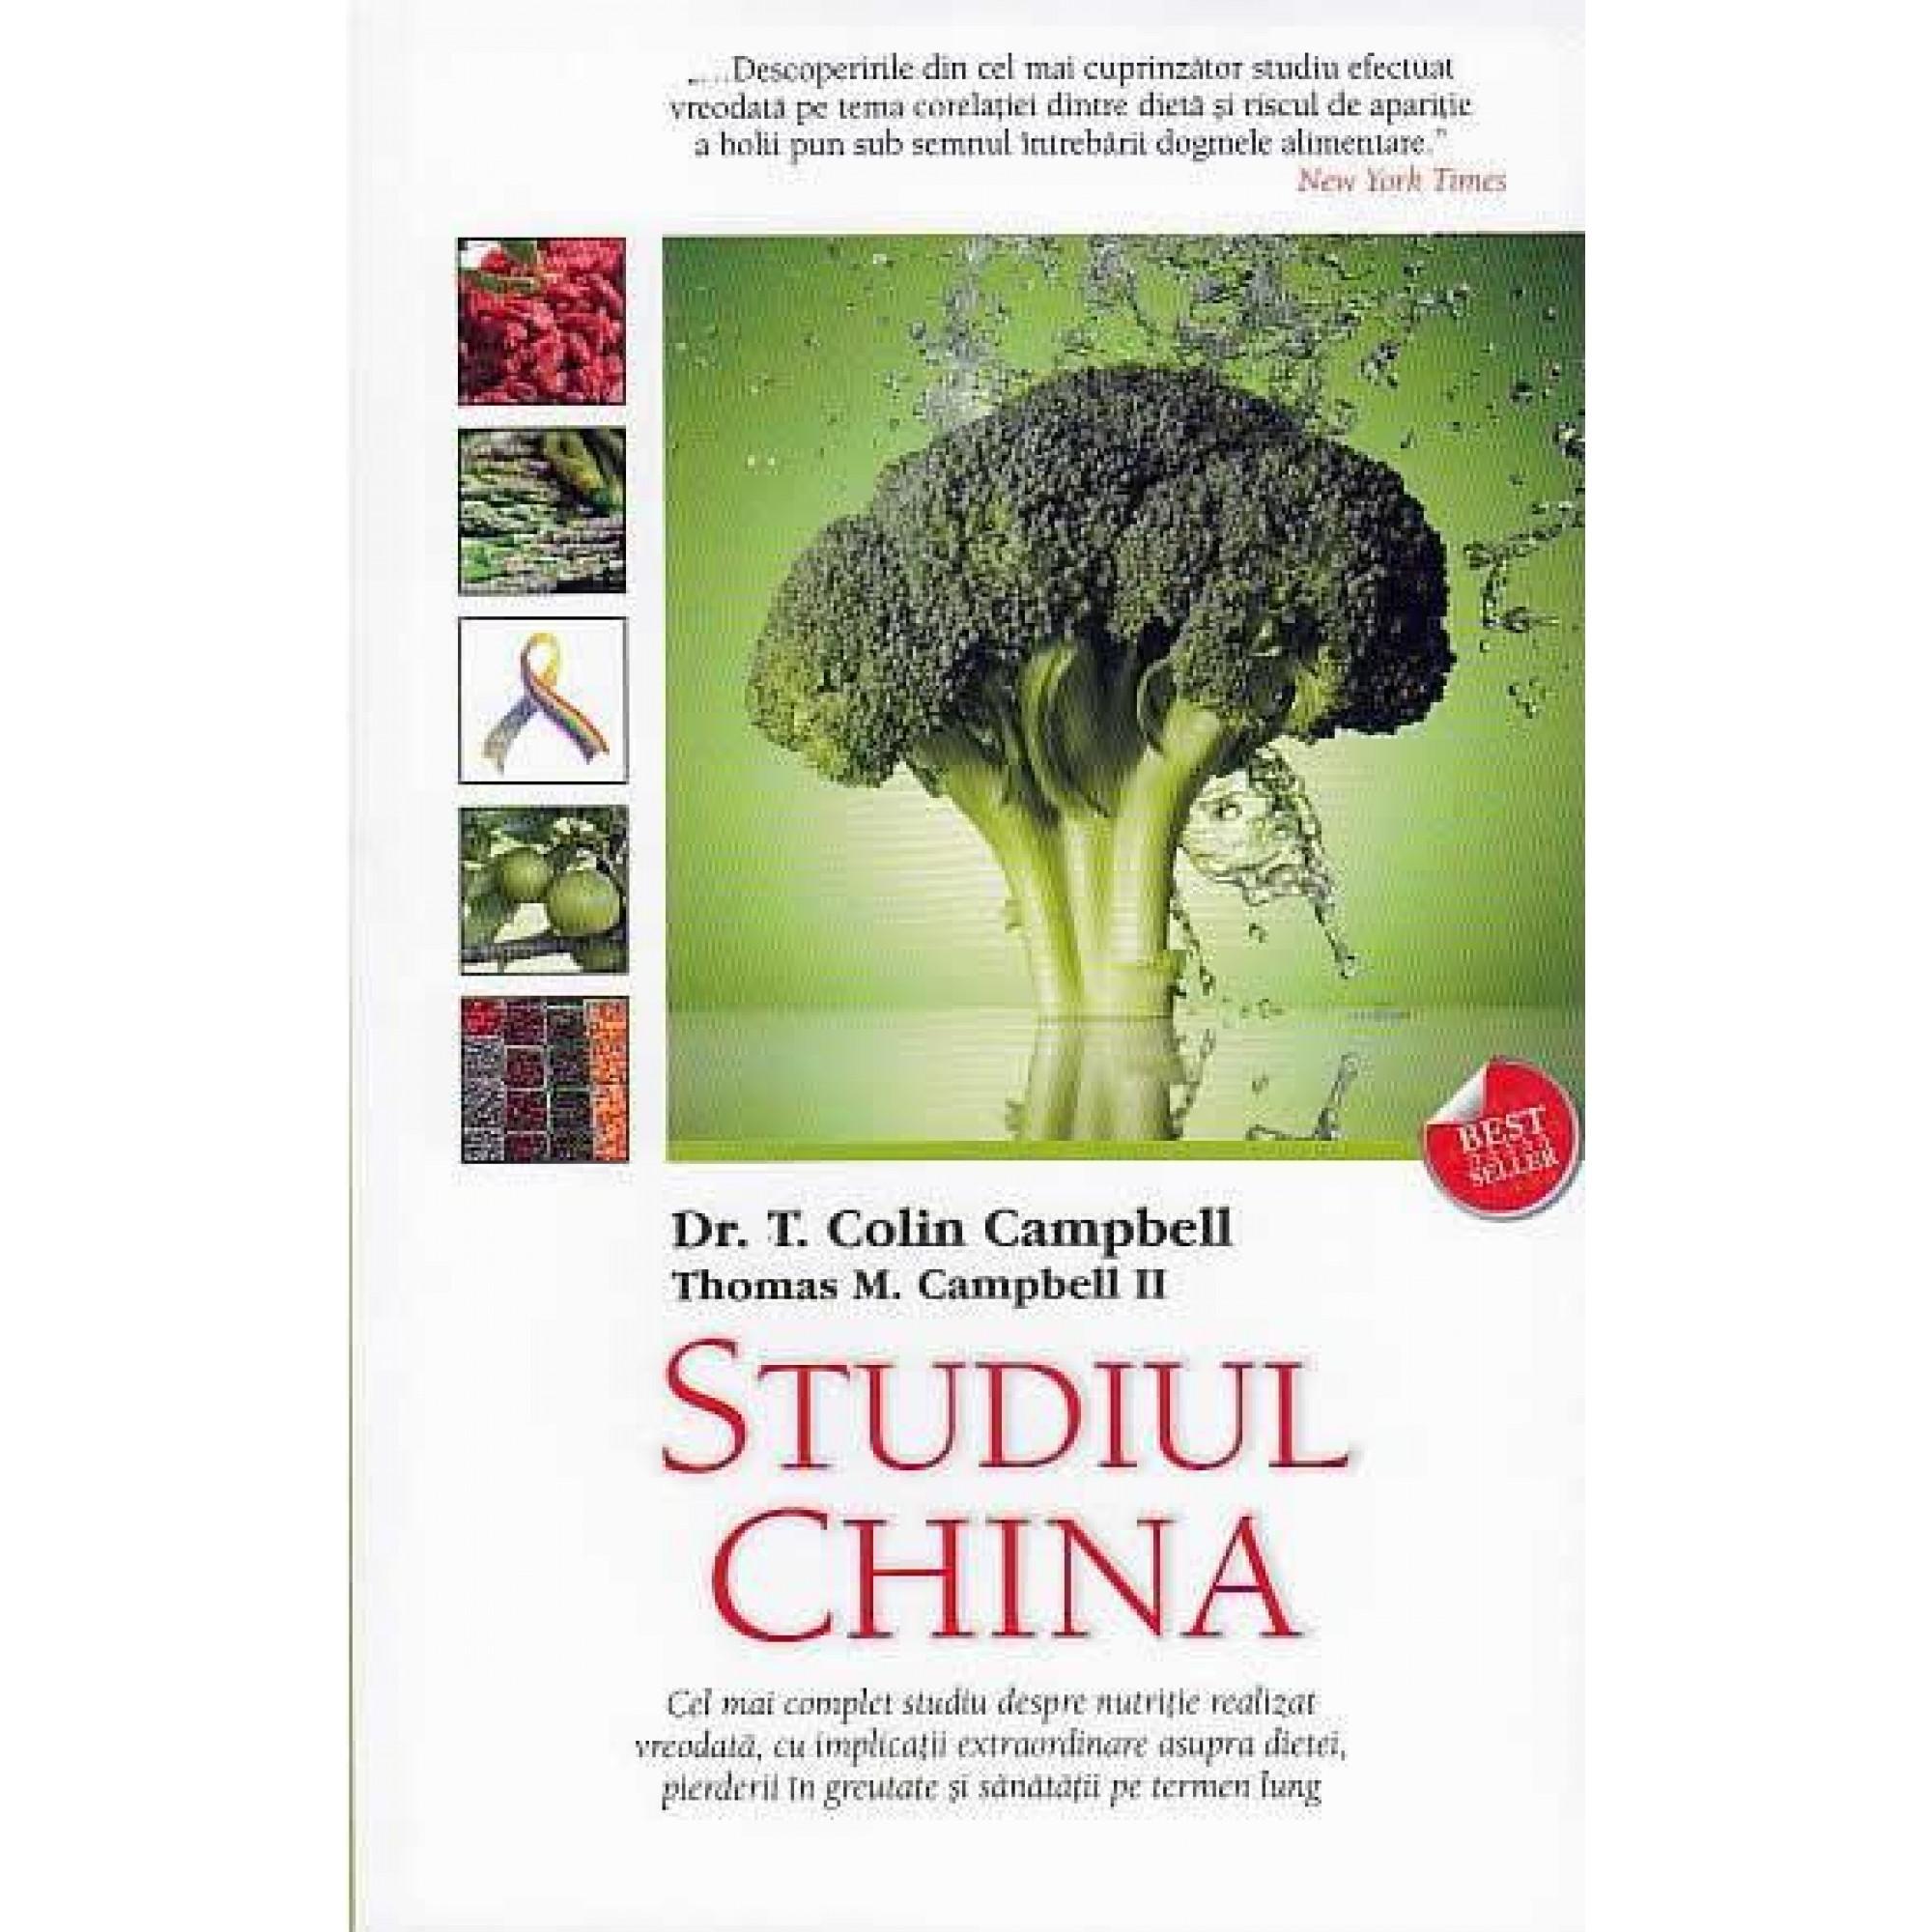 Studiul China; T. Colin Campbell, Thomas M. Campbell II